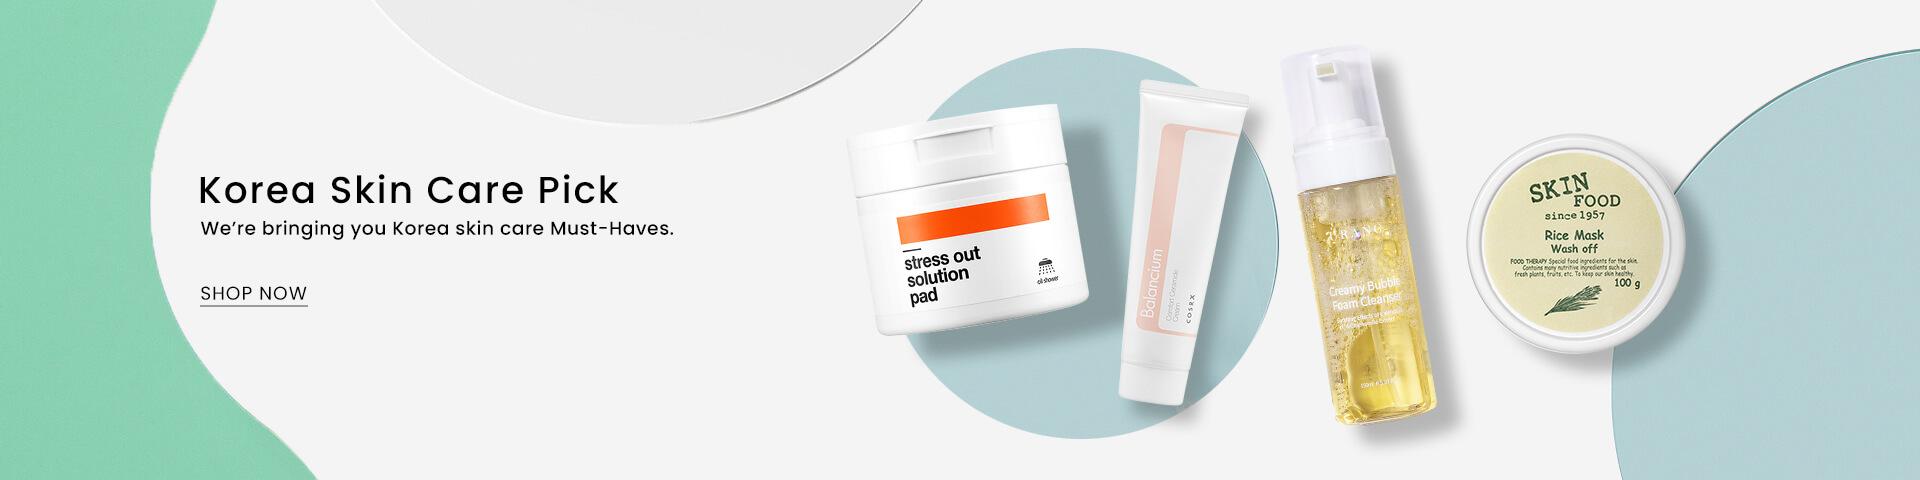 Sept 2019: Skin care top pick (HG)